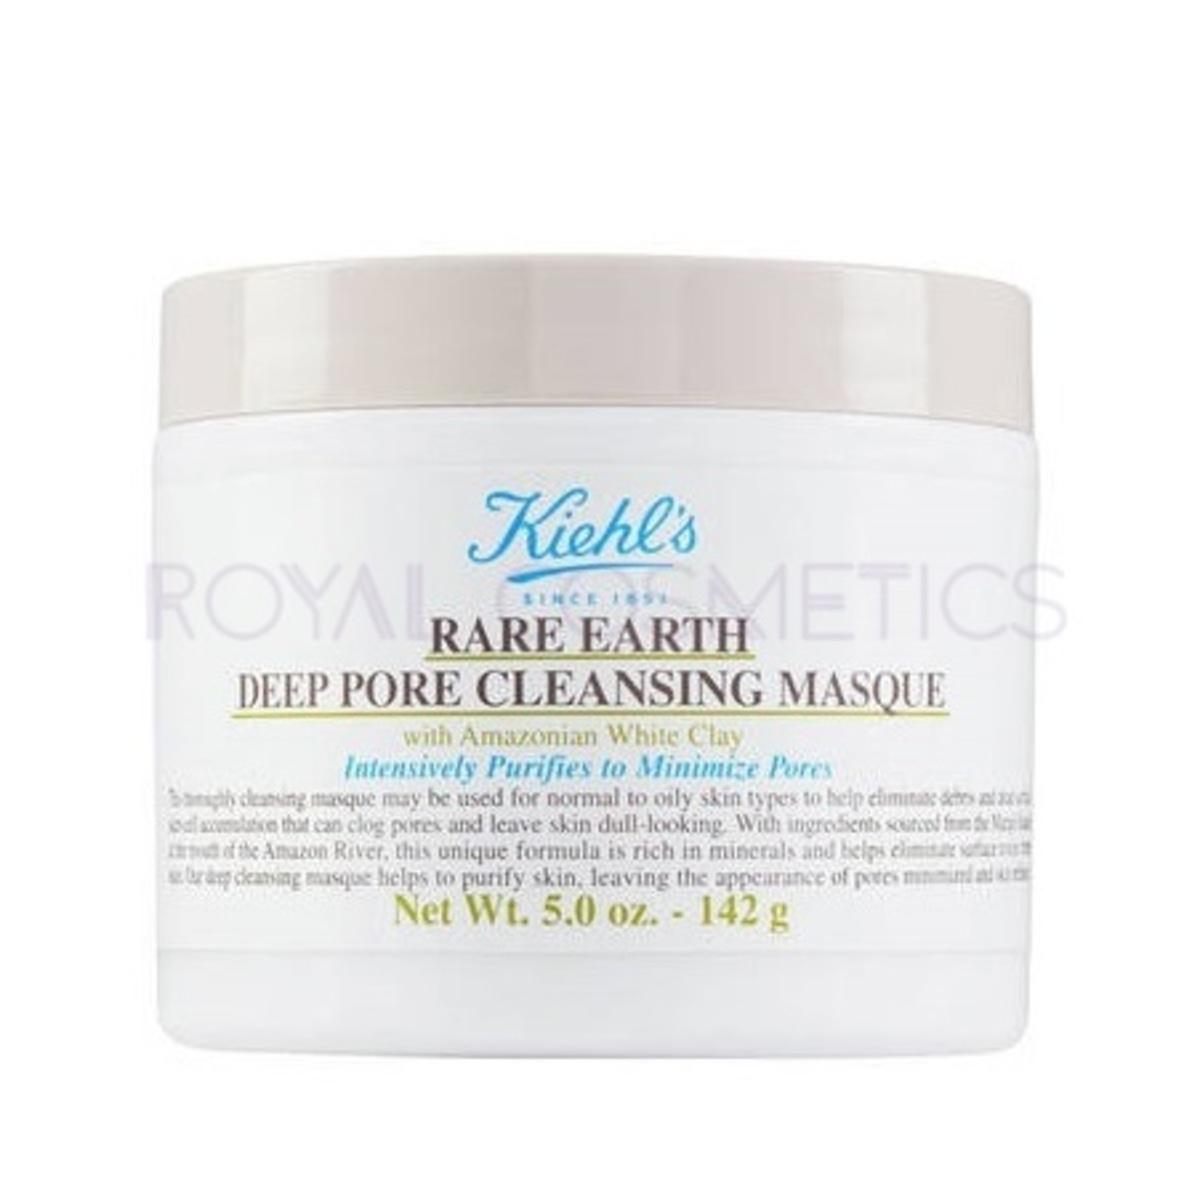 Rare Earth Deep Pore Cleansing Masque 142g (3605975038132)